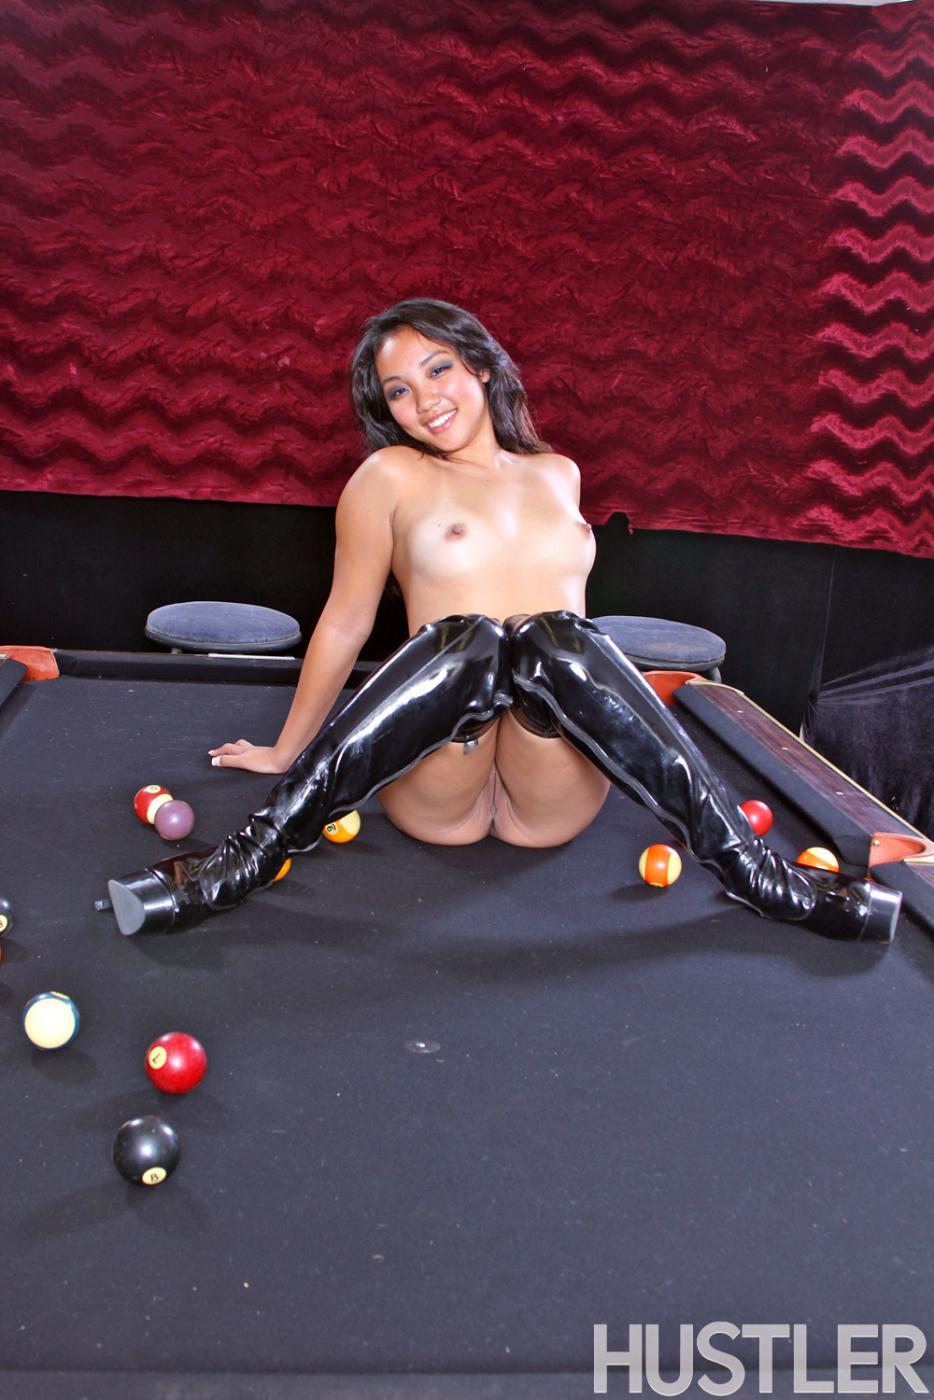 Чувственная тайка Katherine Lee снимает лифчик на бильярдном столе. Порно Katherine снимает трусики.